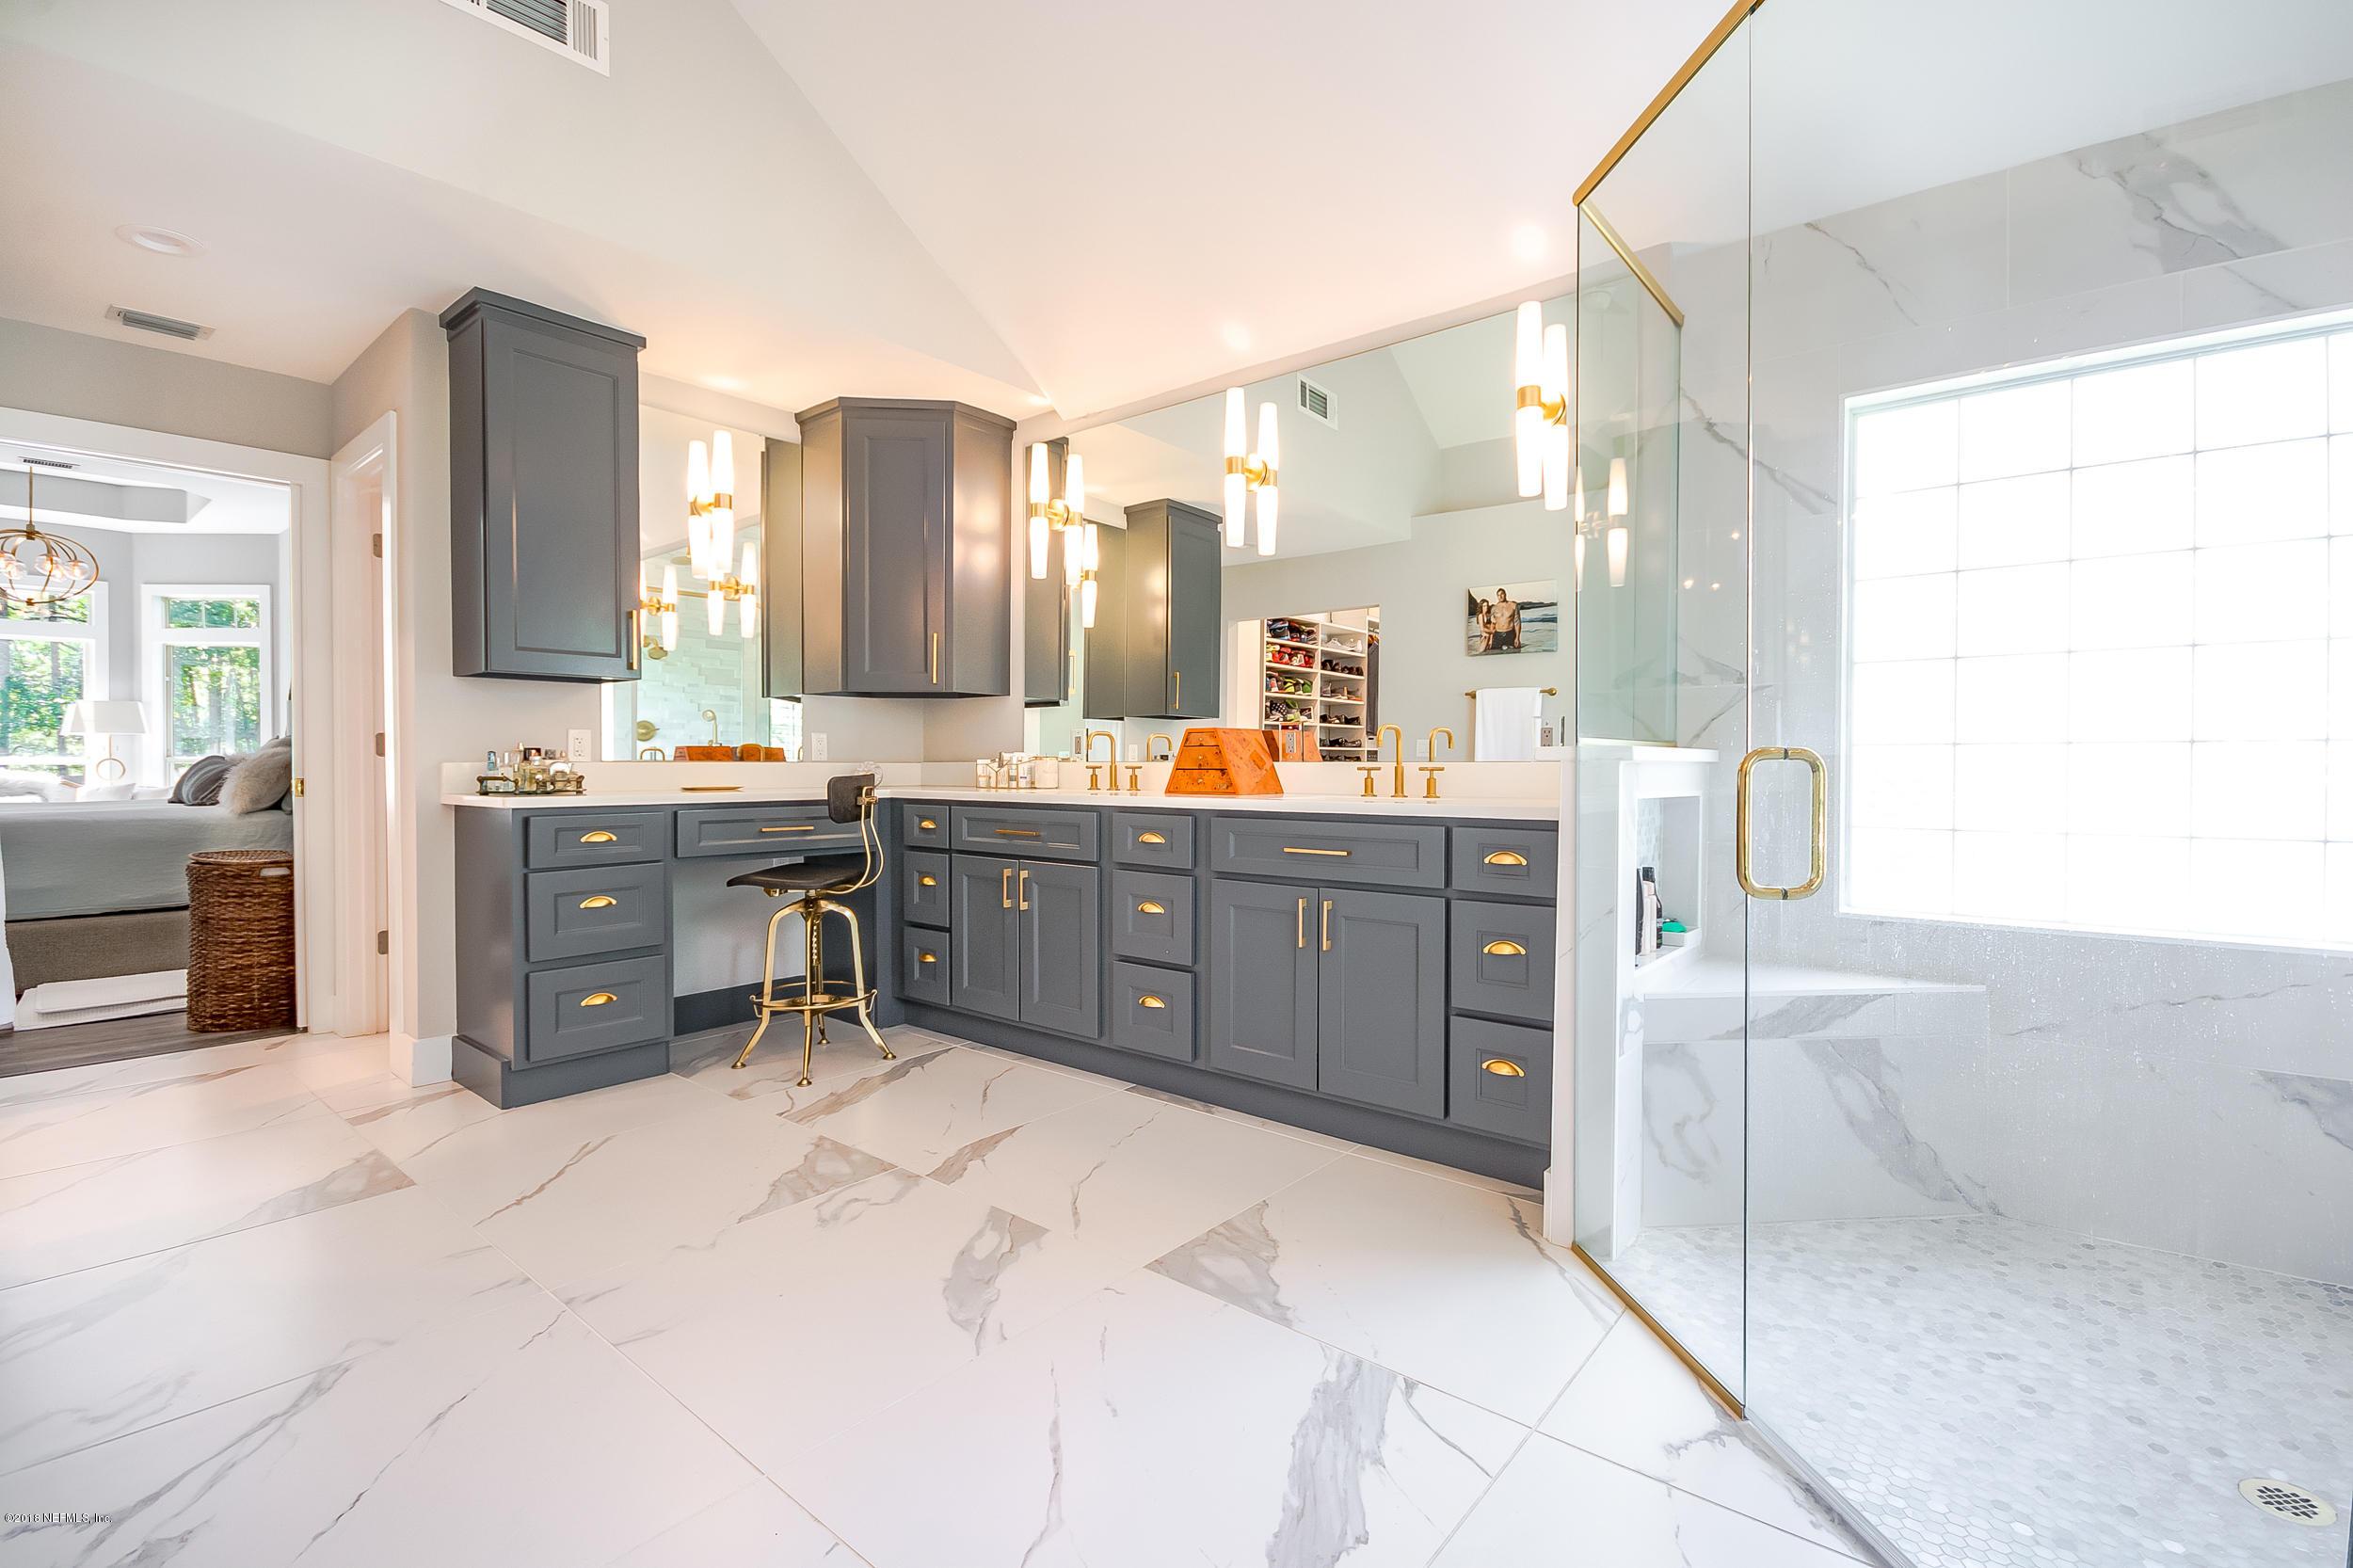 4579 SWILCAN BRIDGE, JACKSONVILLE, FLORIDA 32224, 7 Bedrooms Bedrooms, ,5 BathroomsBathrooms,Residential - single family,For sale,SWILCAN BRIDGE,952013